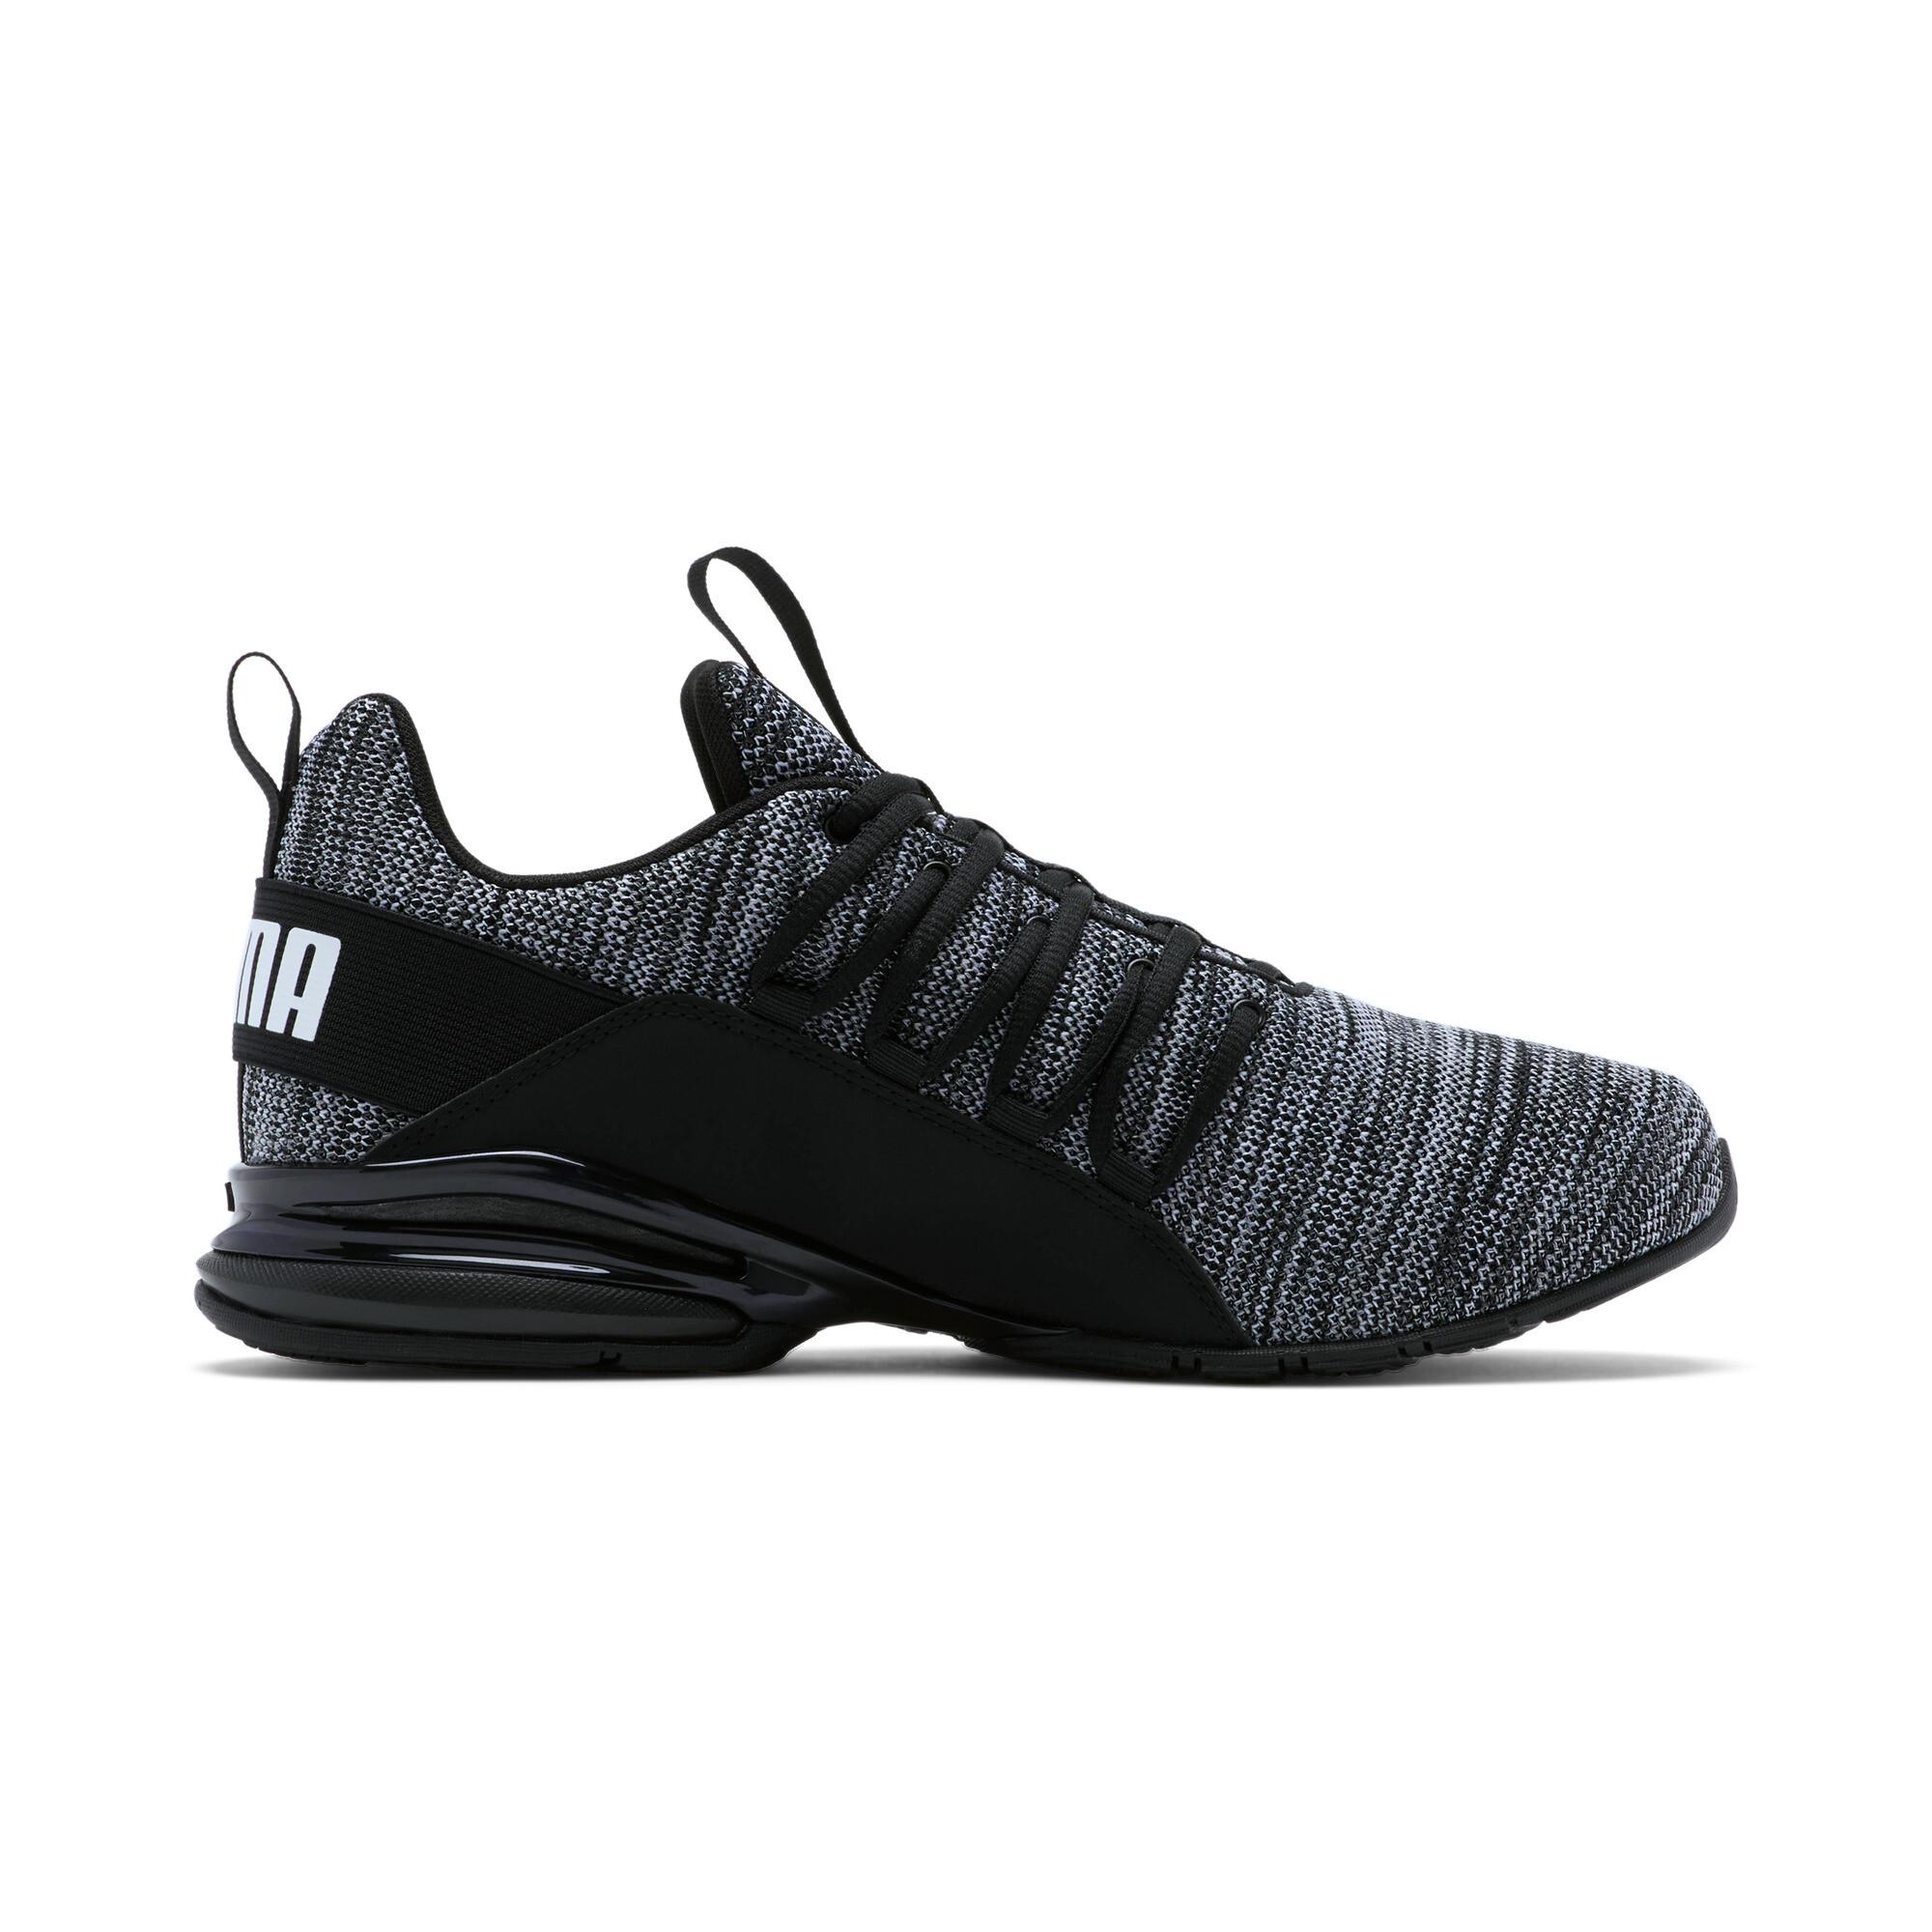 PUMA-Men-039-s-Momenta-Wide-Training-Shoes thumbnail 6